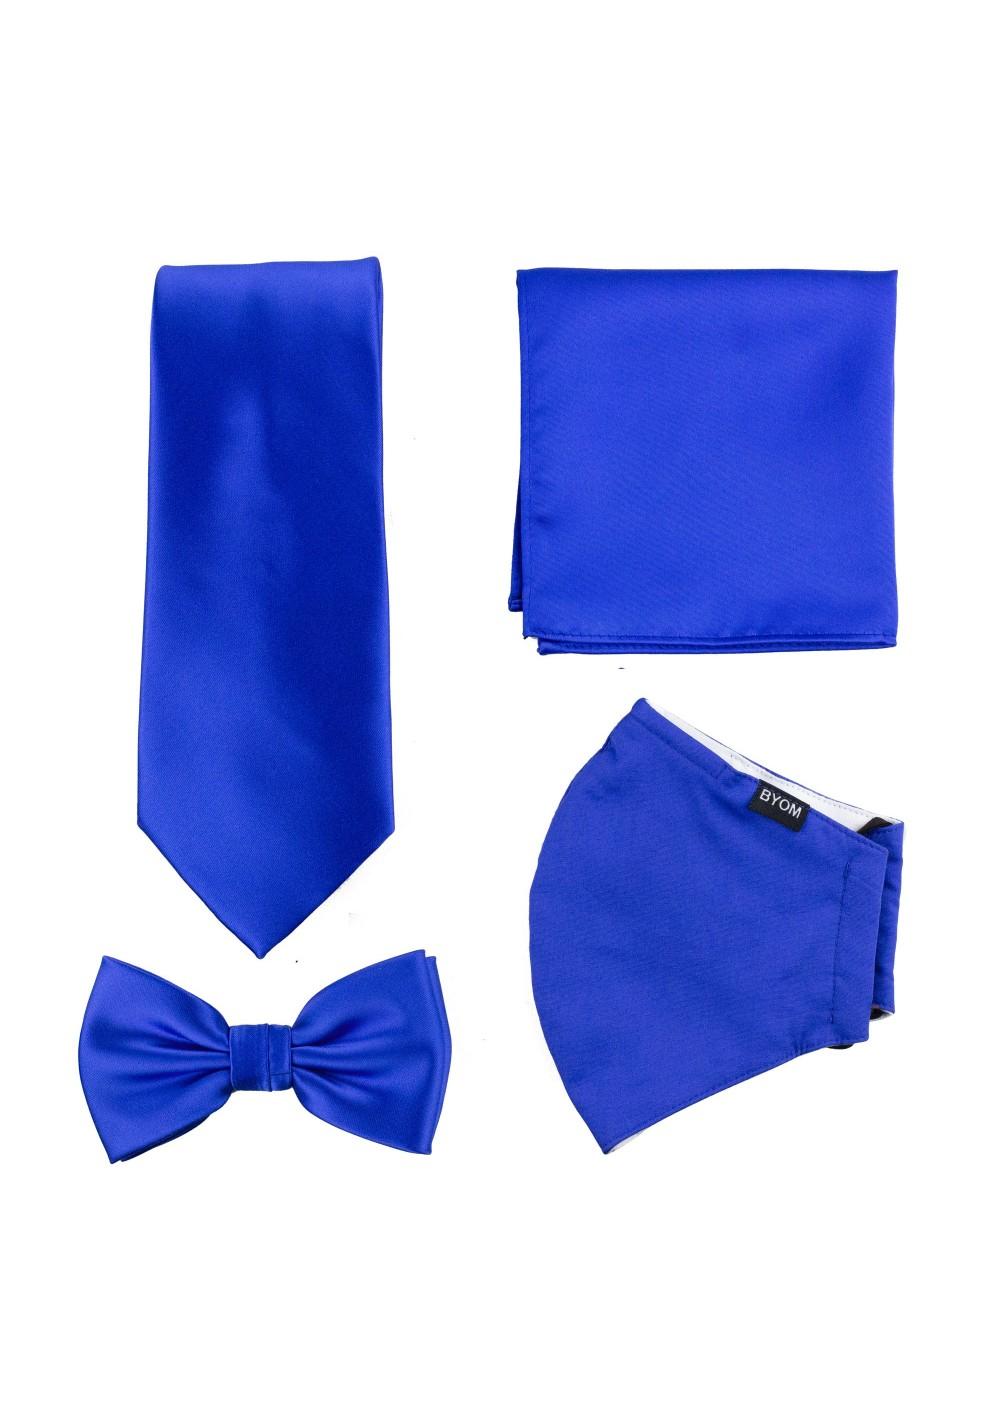 Marine Blue 4-piece Mask and Tie Set